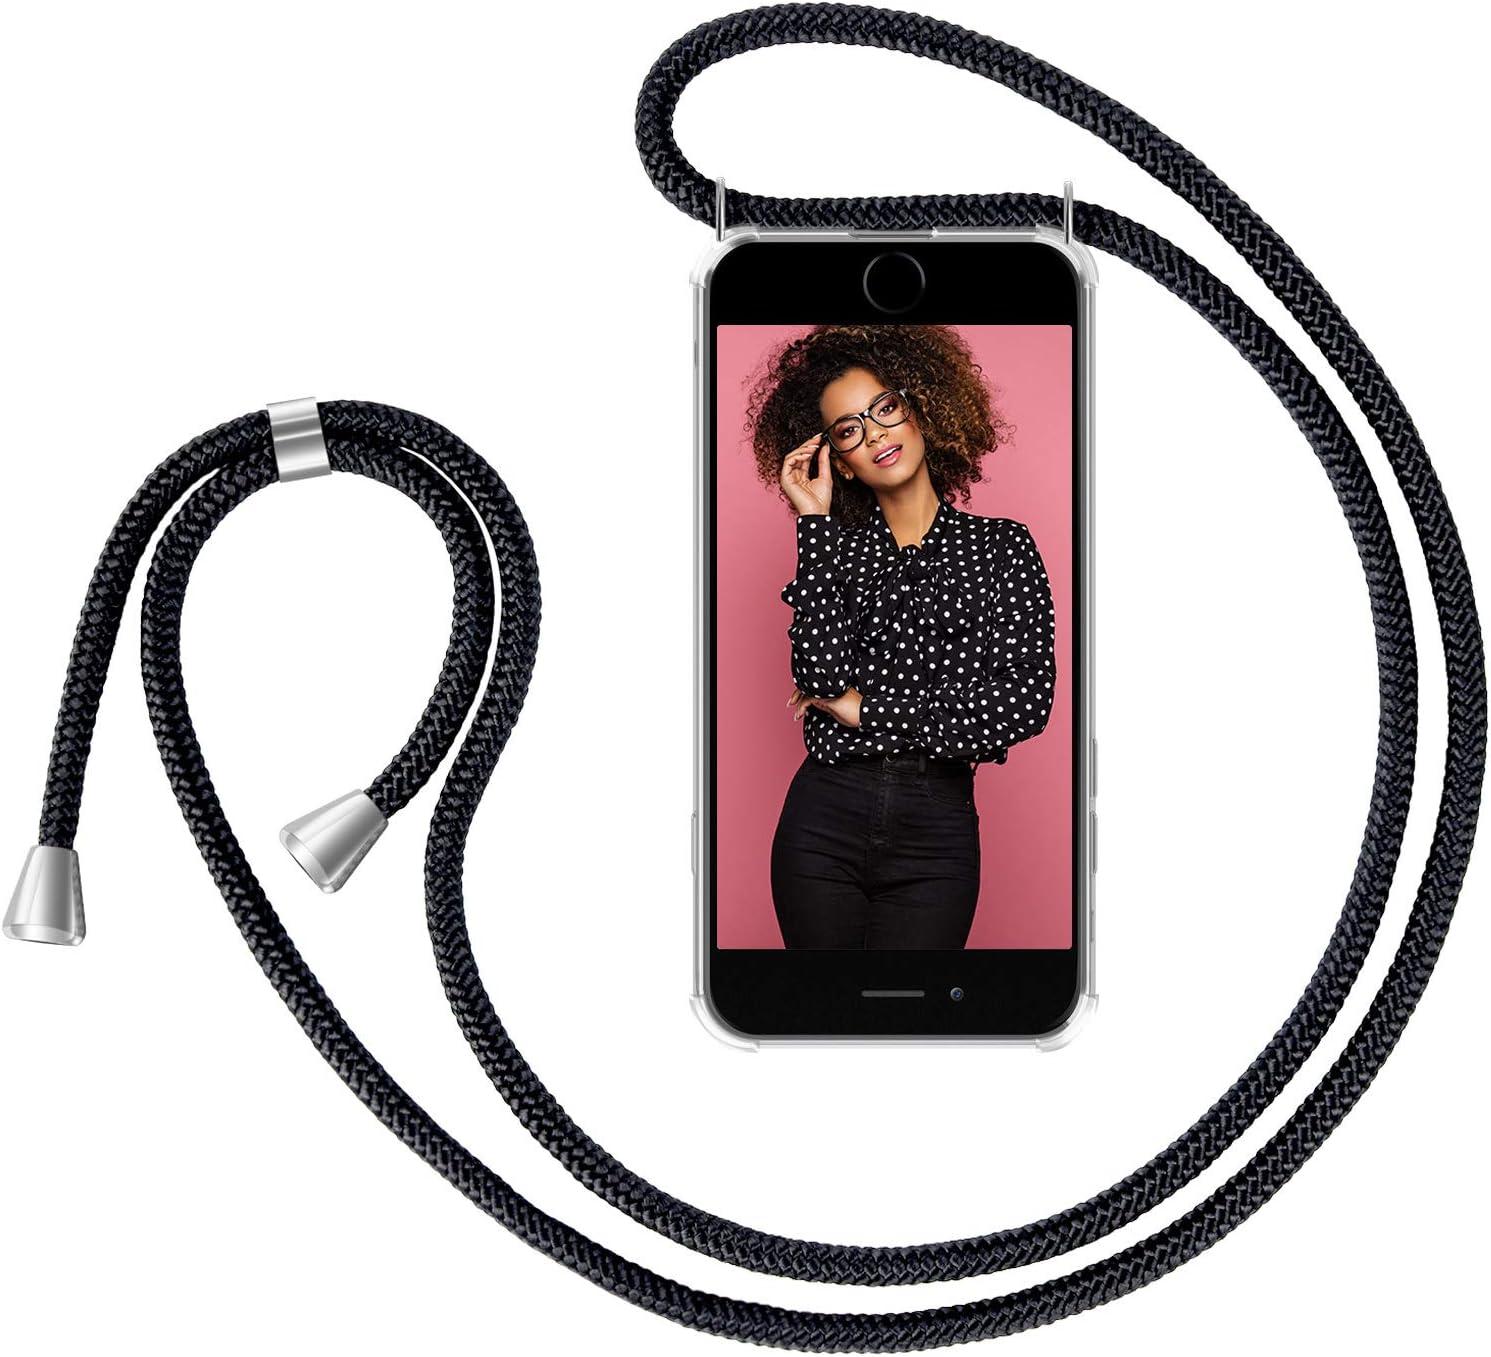 Funda con Collar de Cord/ón para Smartphone Carcasa con Correa para Celular para Llevar ZhinkArts Cadena para Tel/éfono M/óvil Compatible con Apple iPhone 7 Plus // 8 Plus Oro